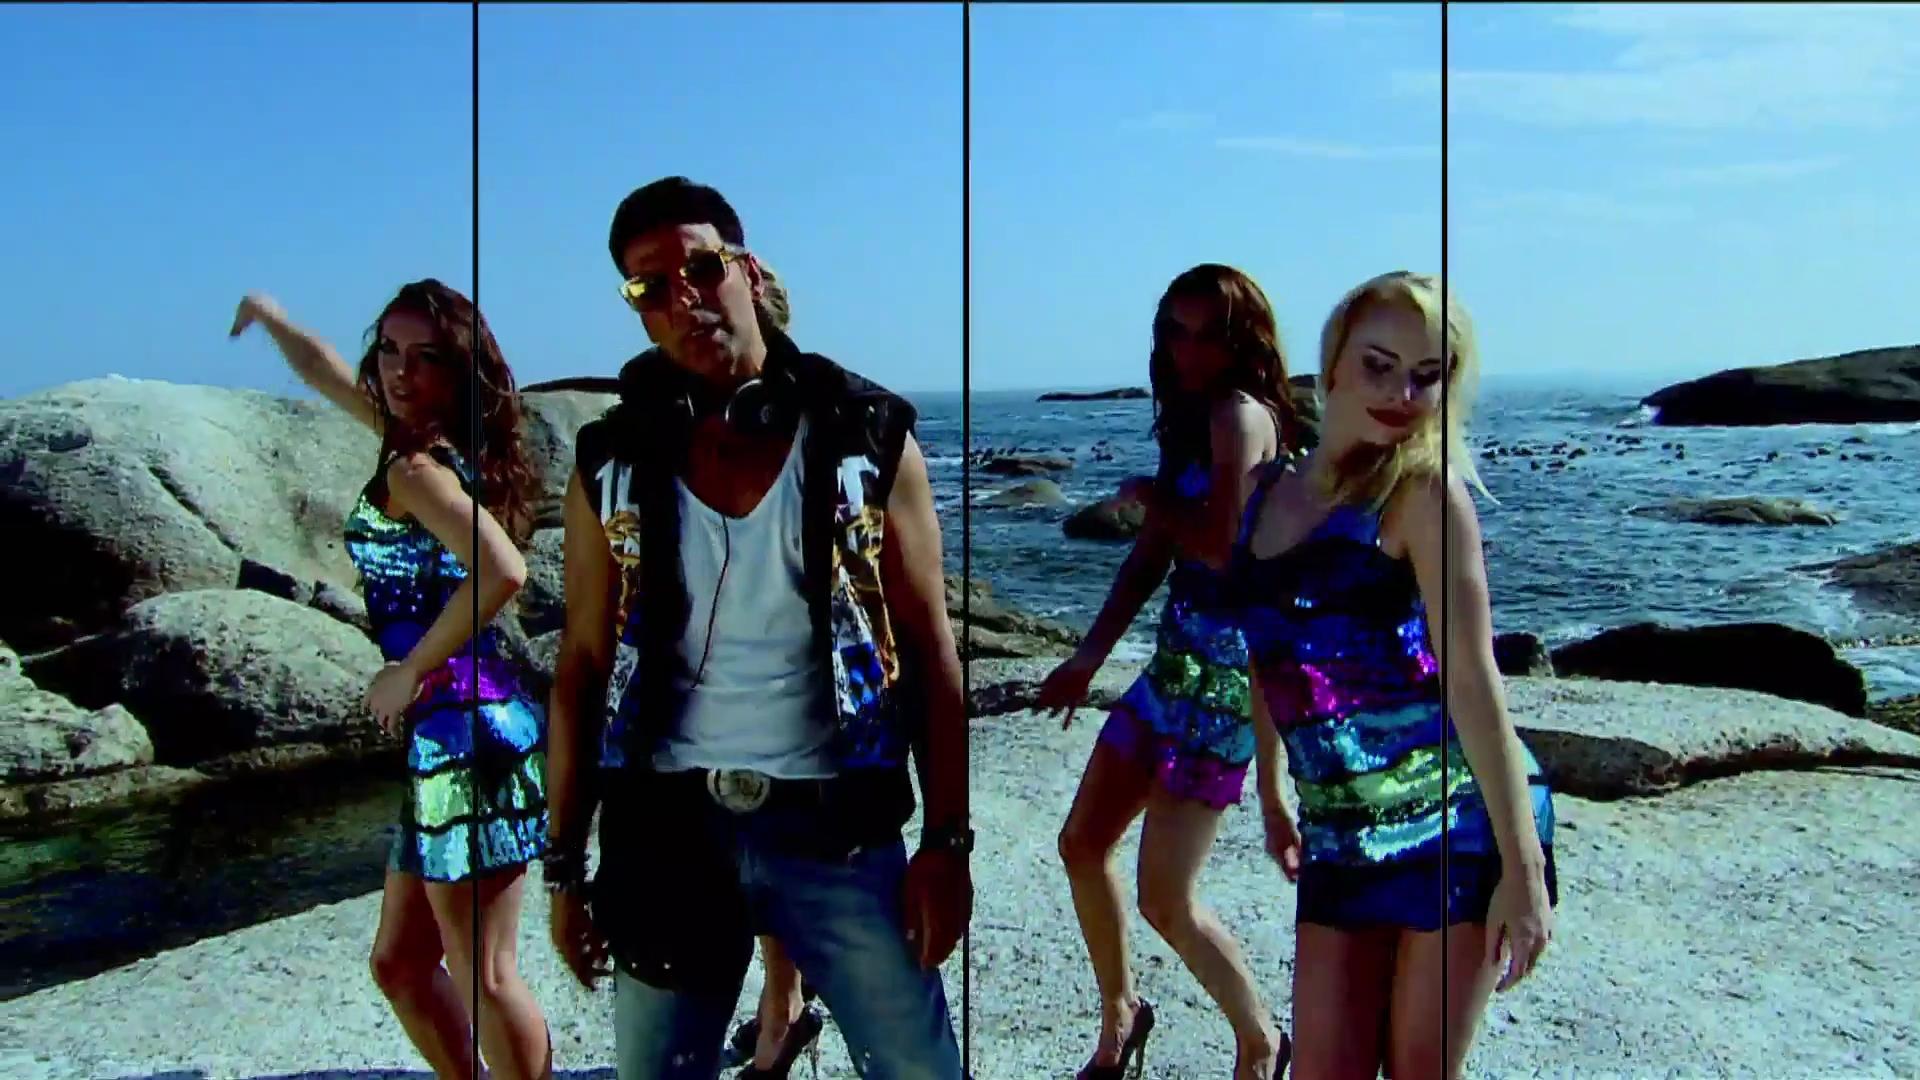 z_2014 - Dare2dance rap song_1080p.mp47167.jpg